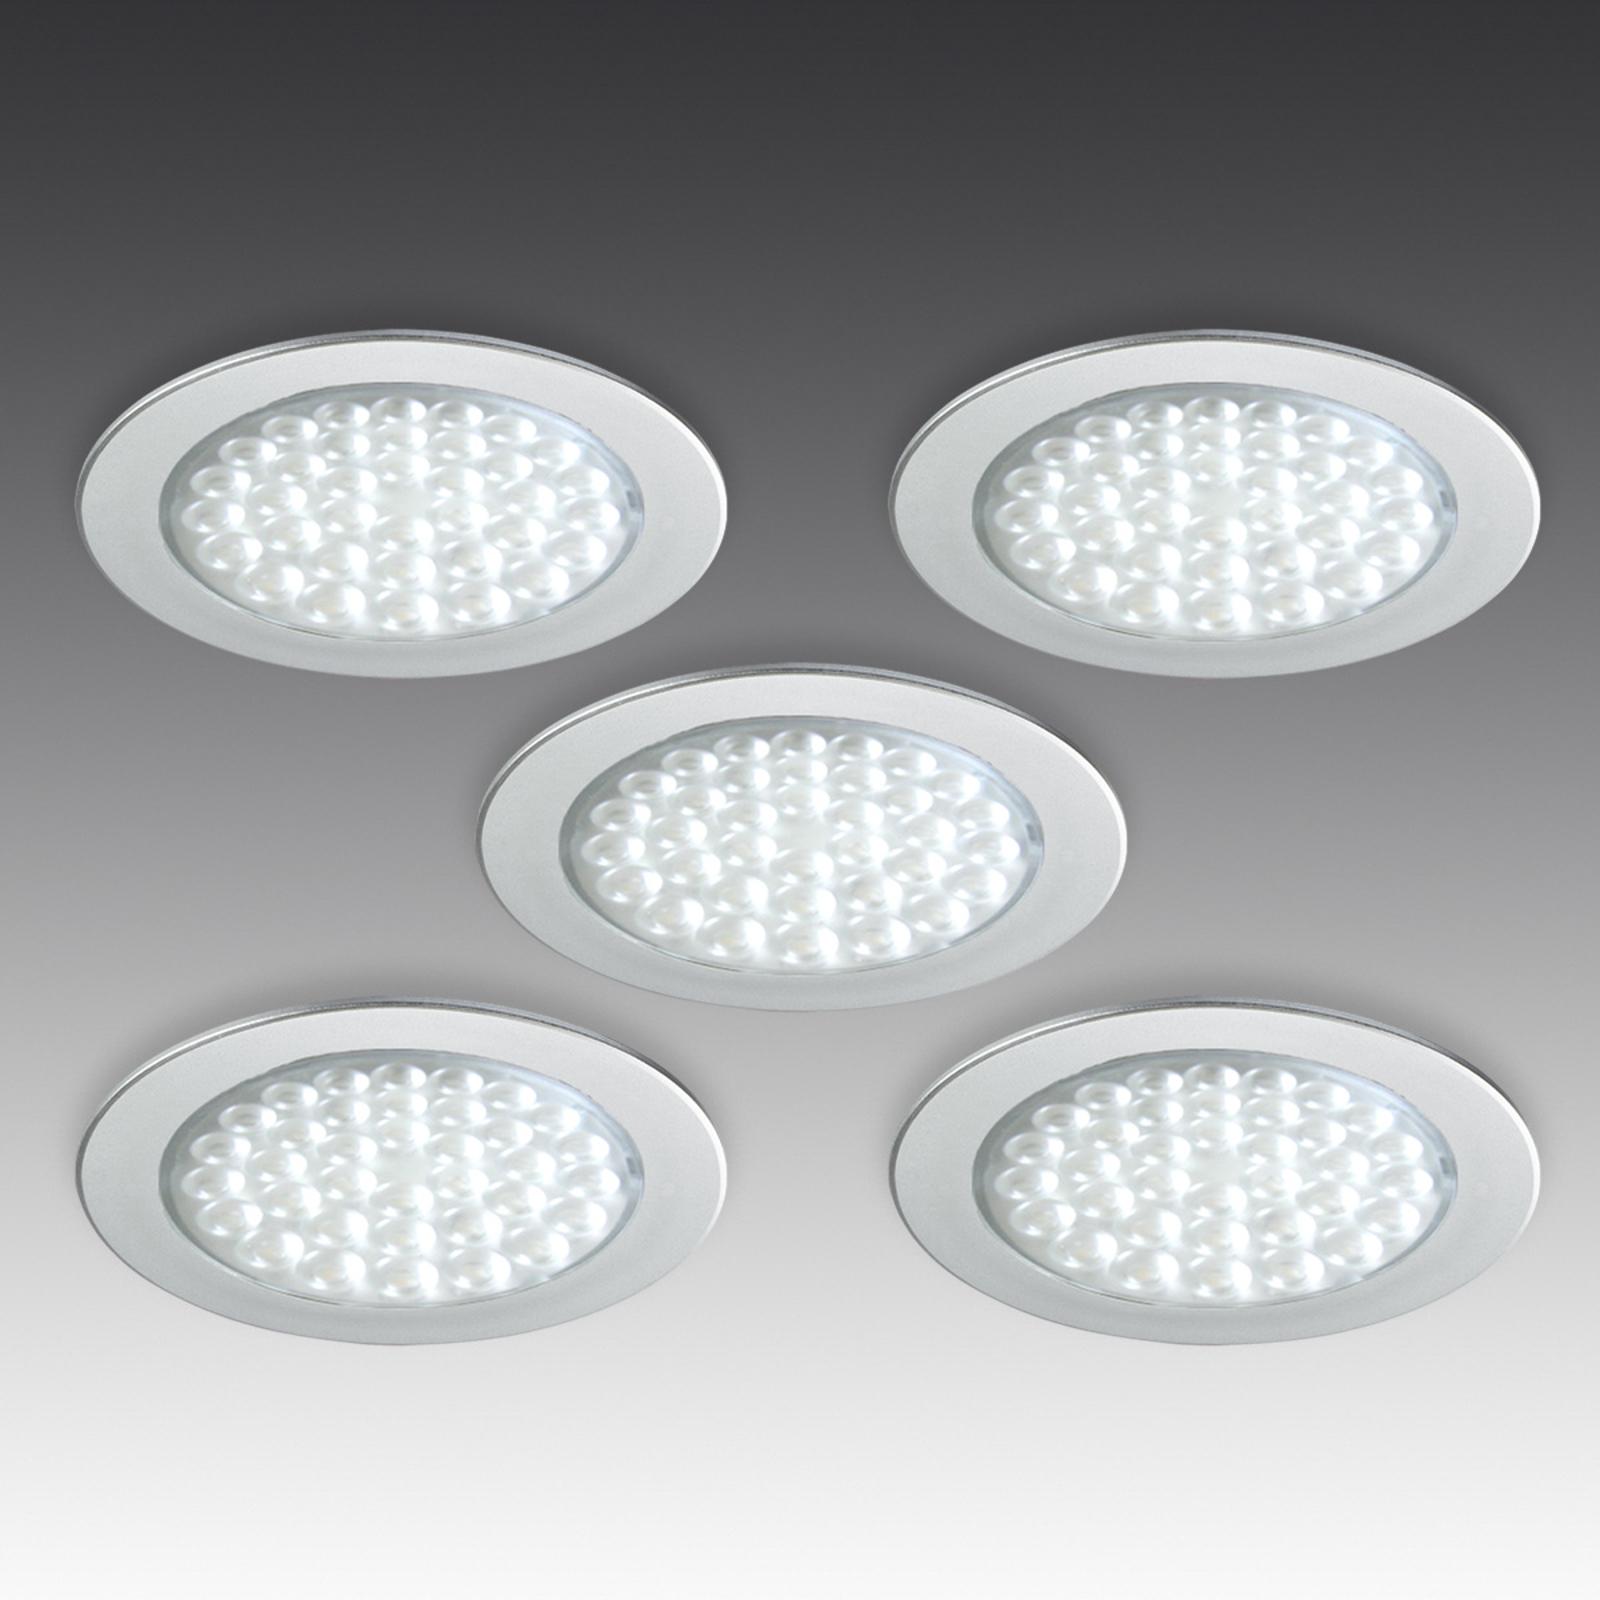 R 68 LED inbouwspot in RVS optiek, 5/set